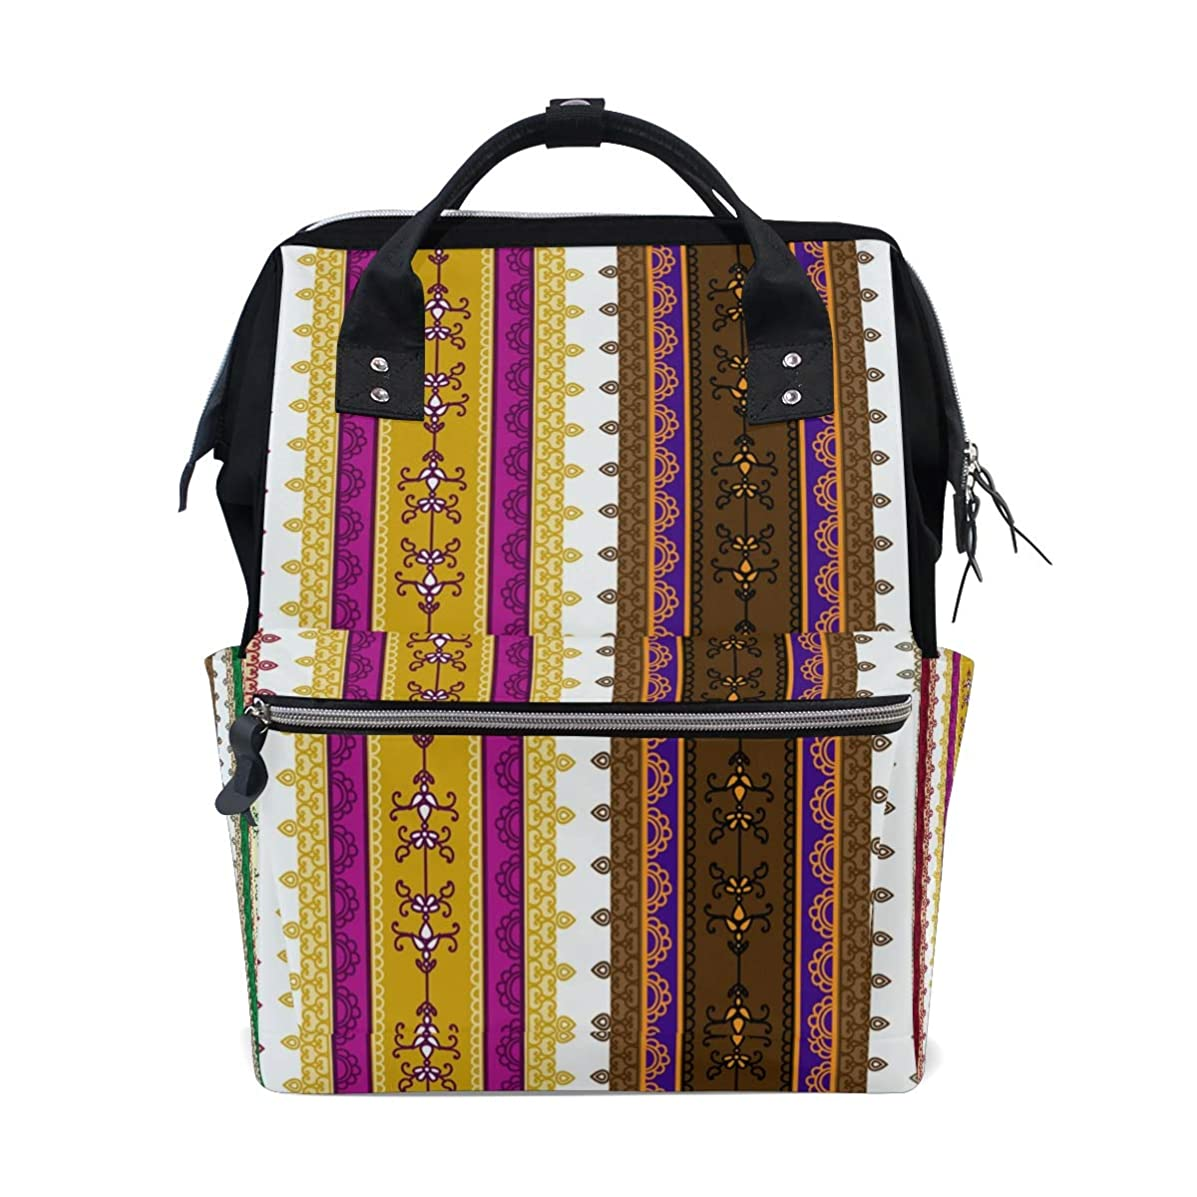 Boho Vintage Vertical Striped Pattern School Backpack Large Capacity Mummy Bags Laptop Handbag Casual Travel Rucksack Satchel For Women Men Adult Teen Children